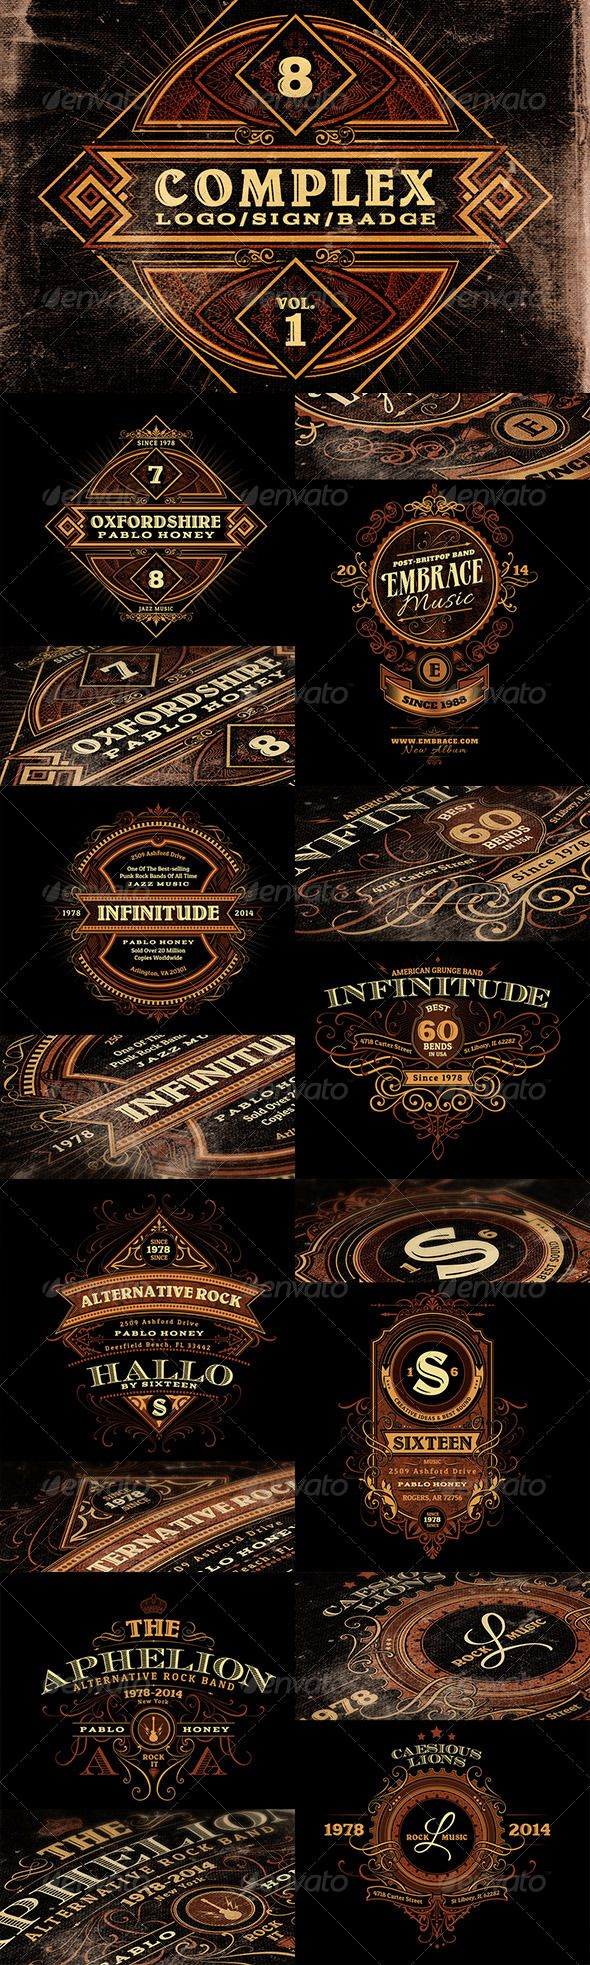 Complex Logos/Signs/Badges v.1   Tipografía